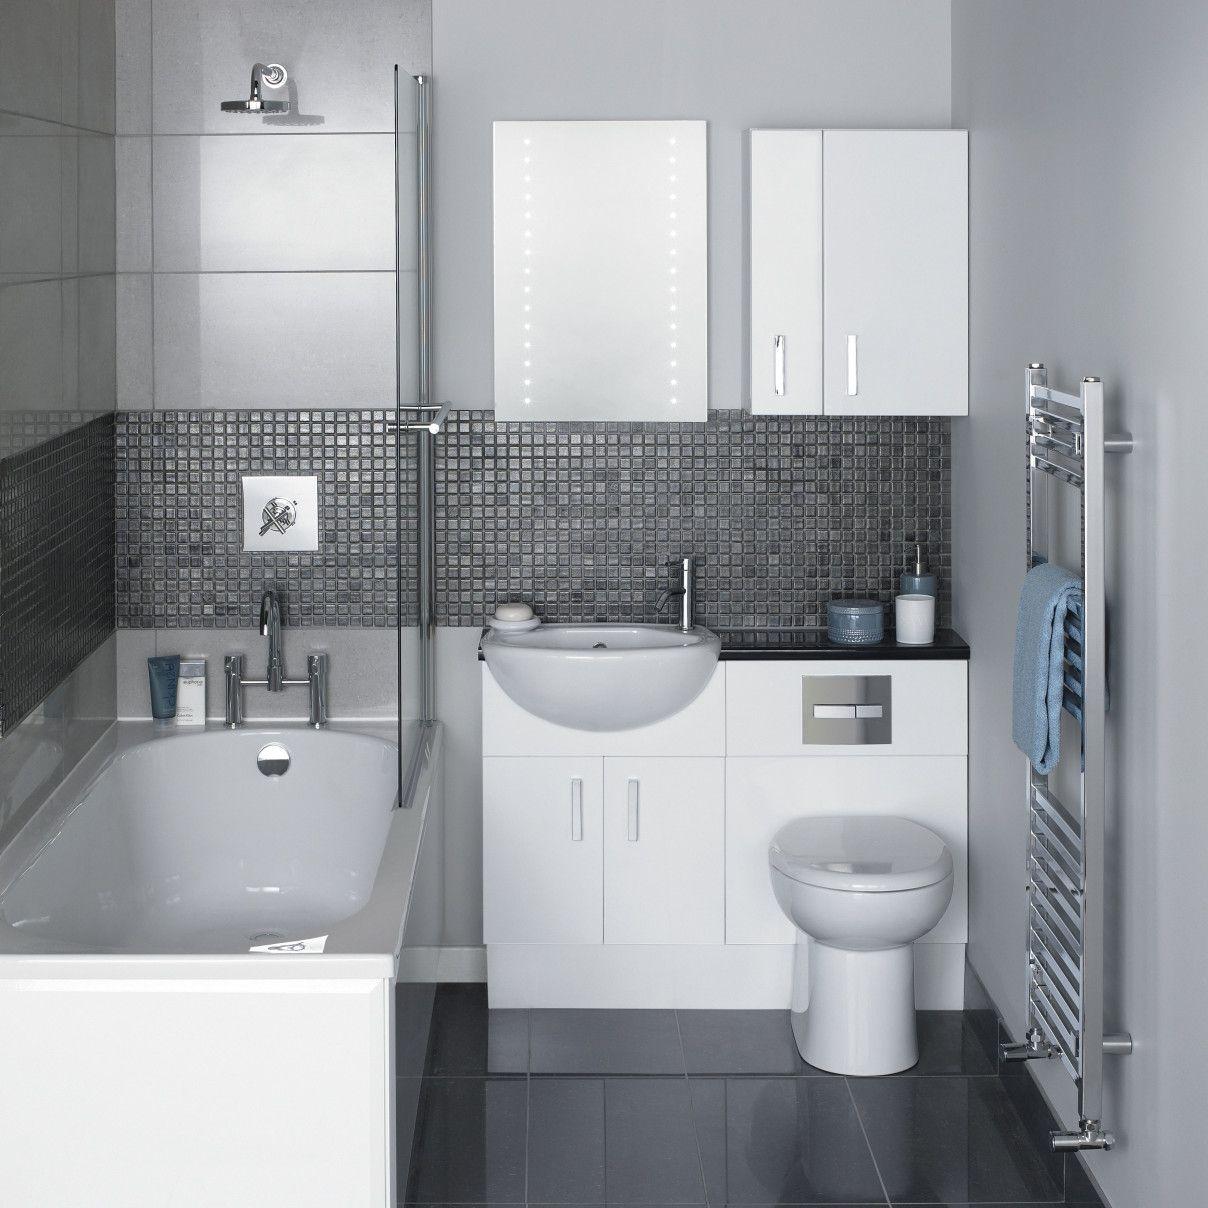 Space Saving Bathroom Sink Cabinets   Bathroom Exclusiv   Pinterest ...